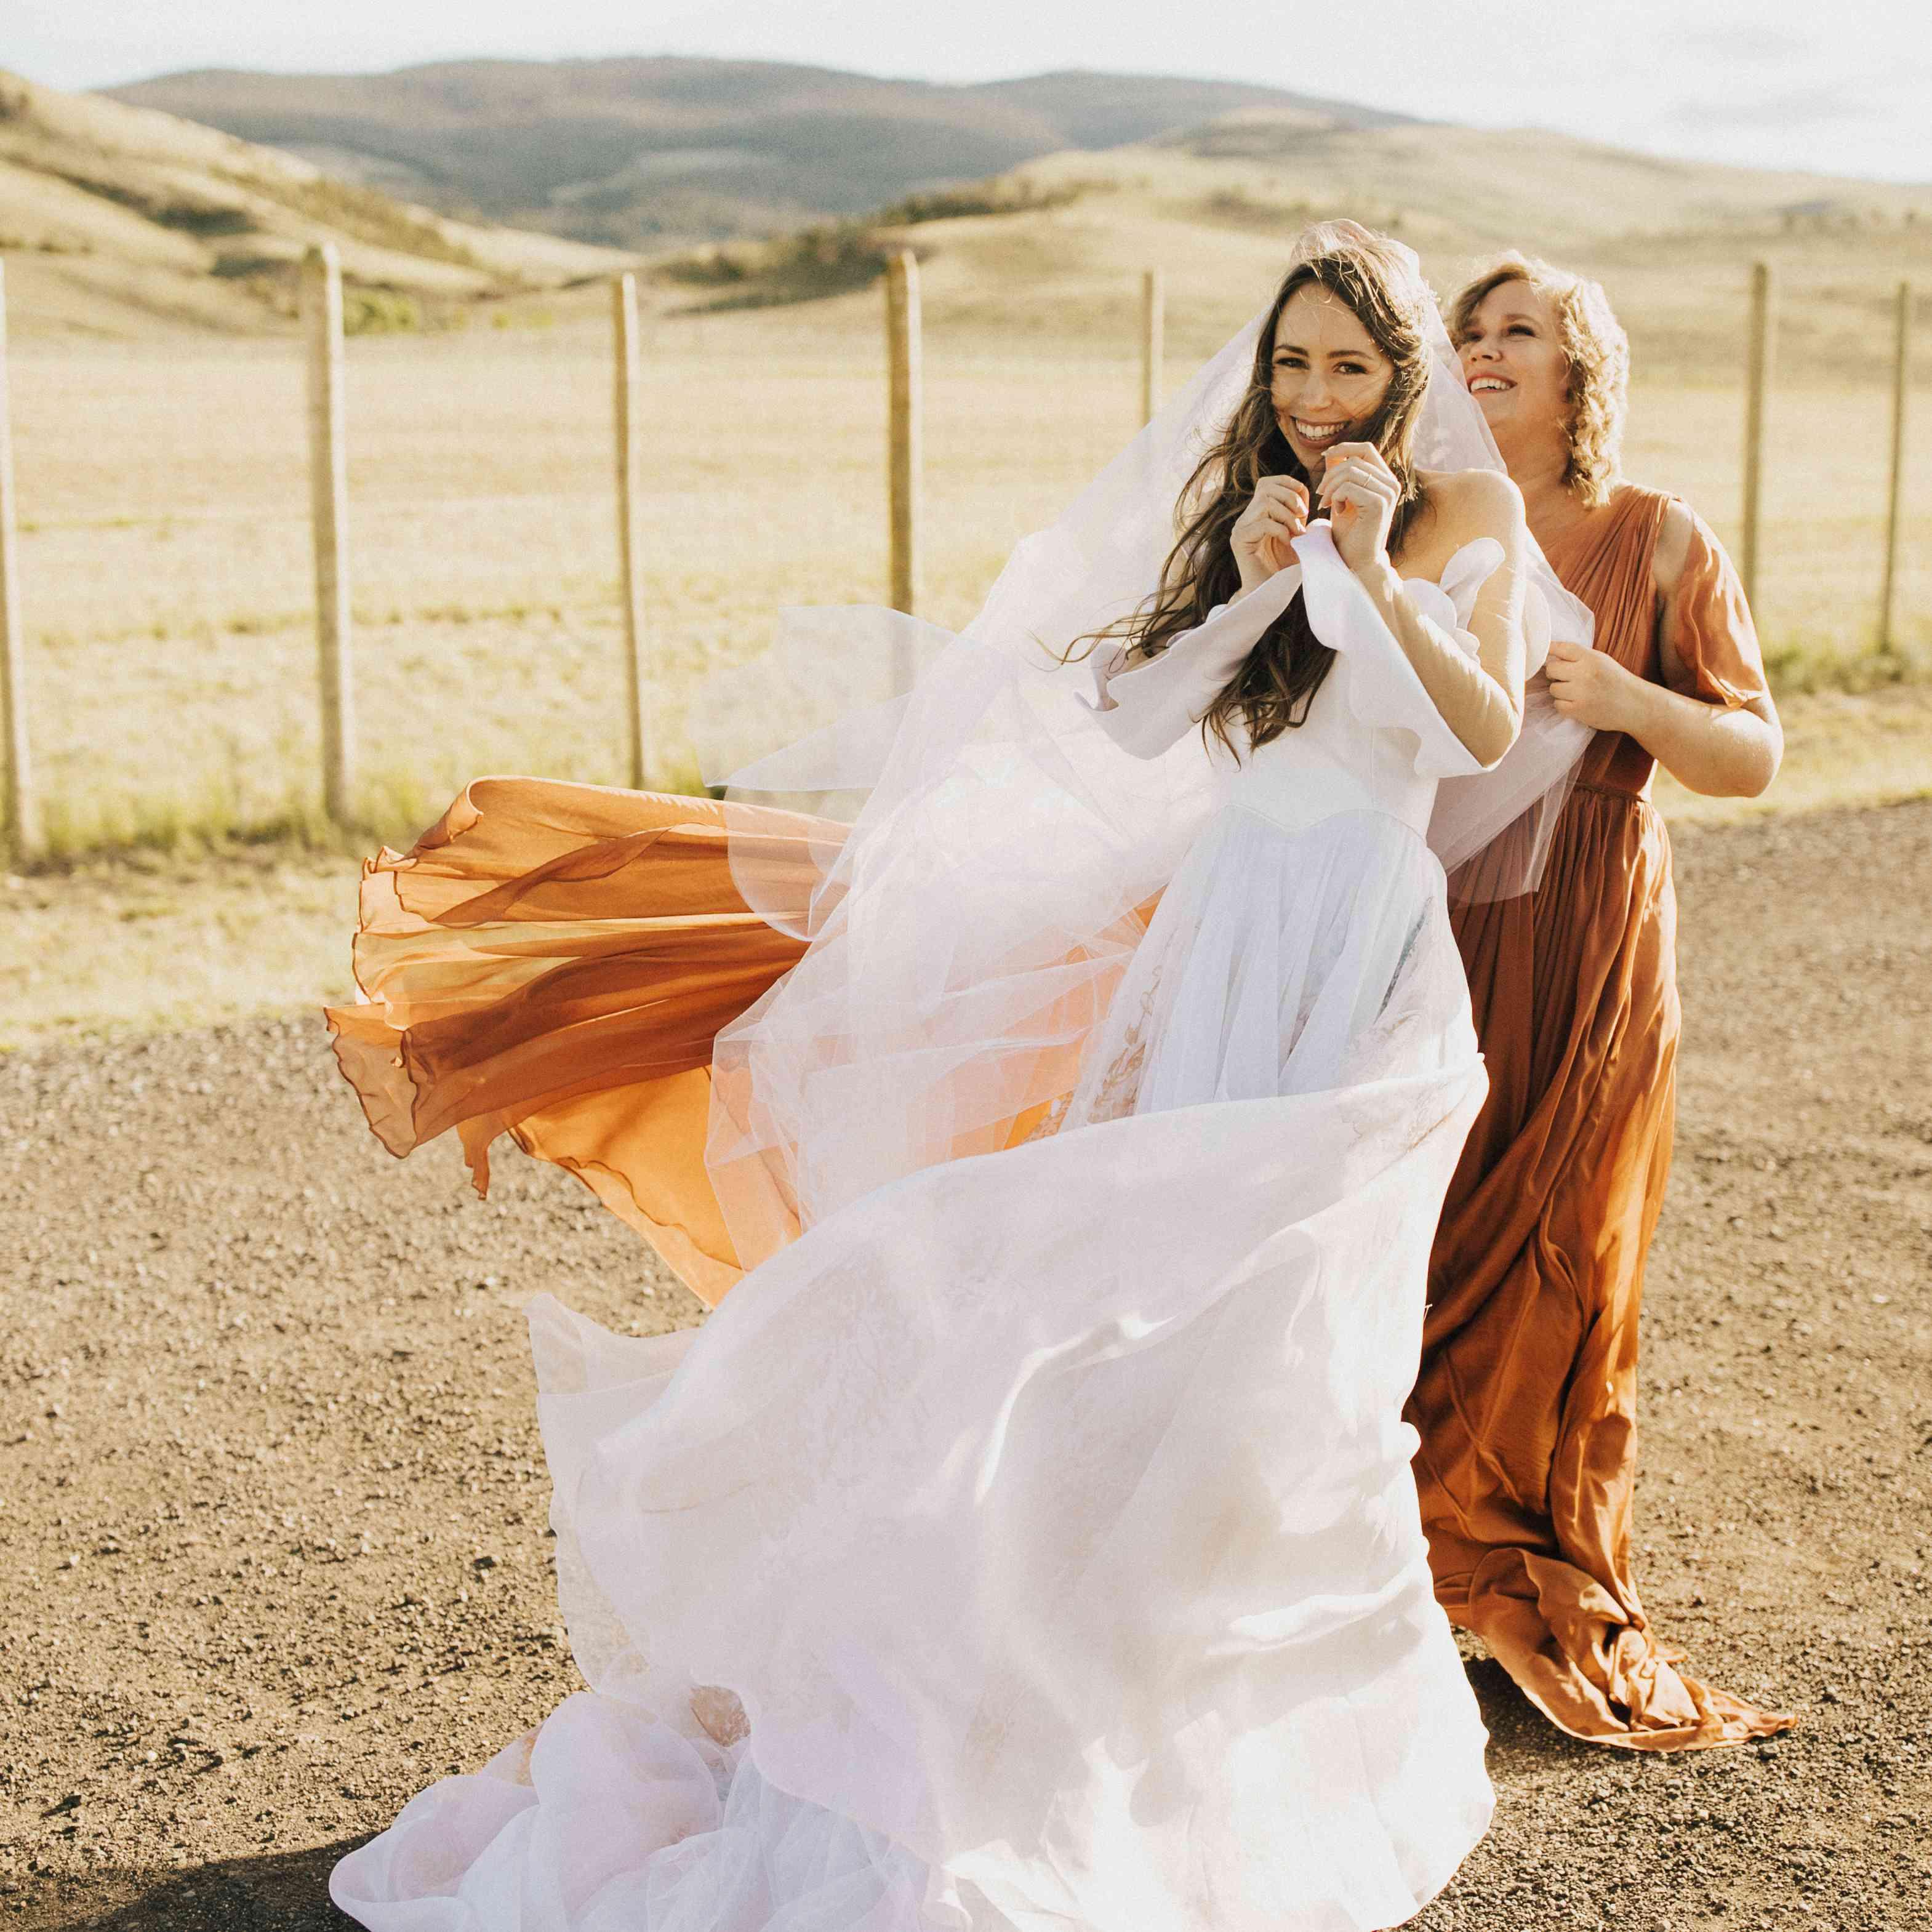 Bridal Designer Leanne Marshall's Intimate Wyoming Elopement